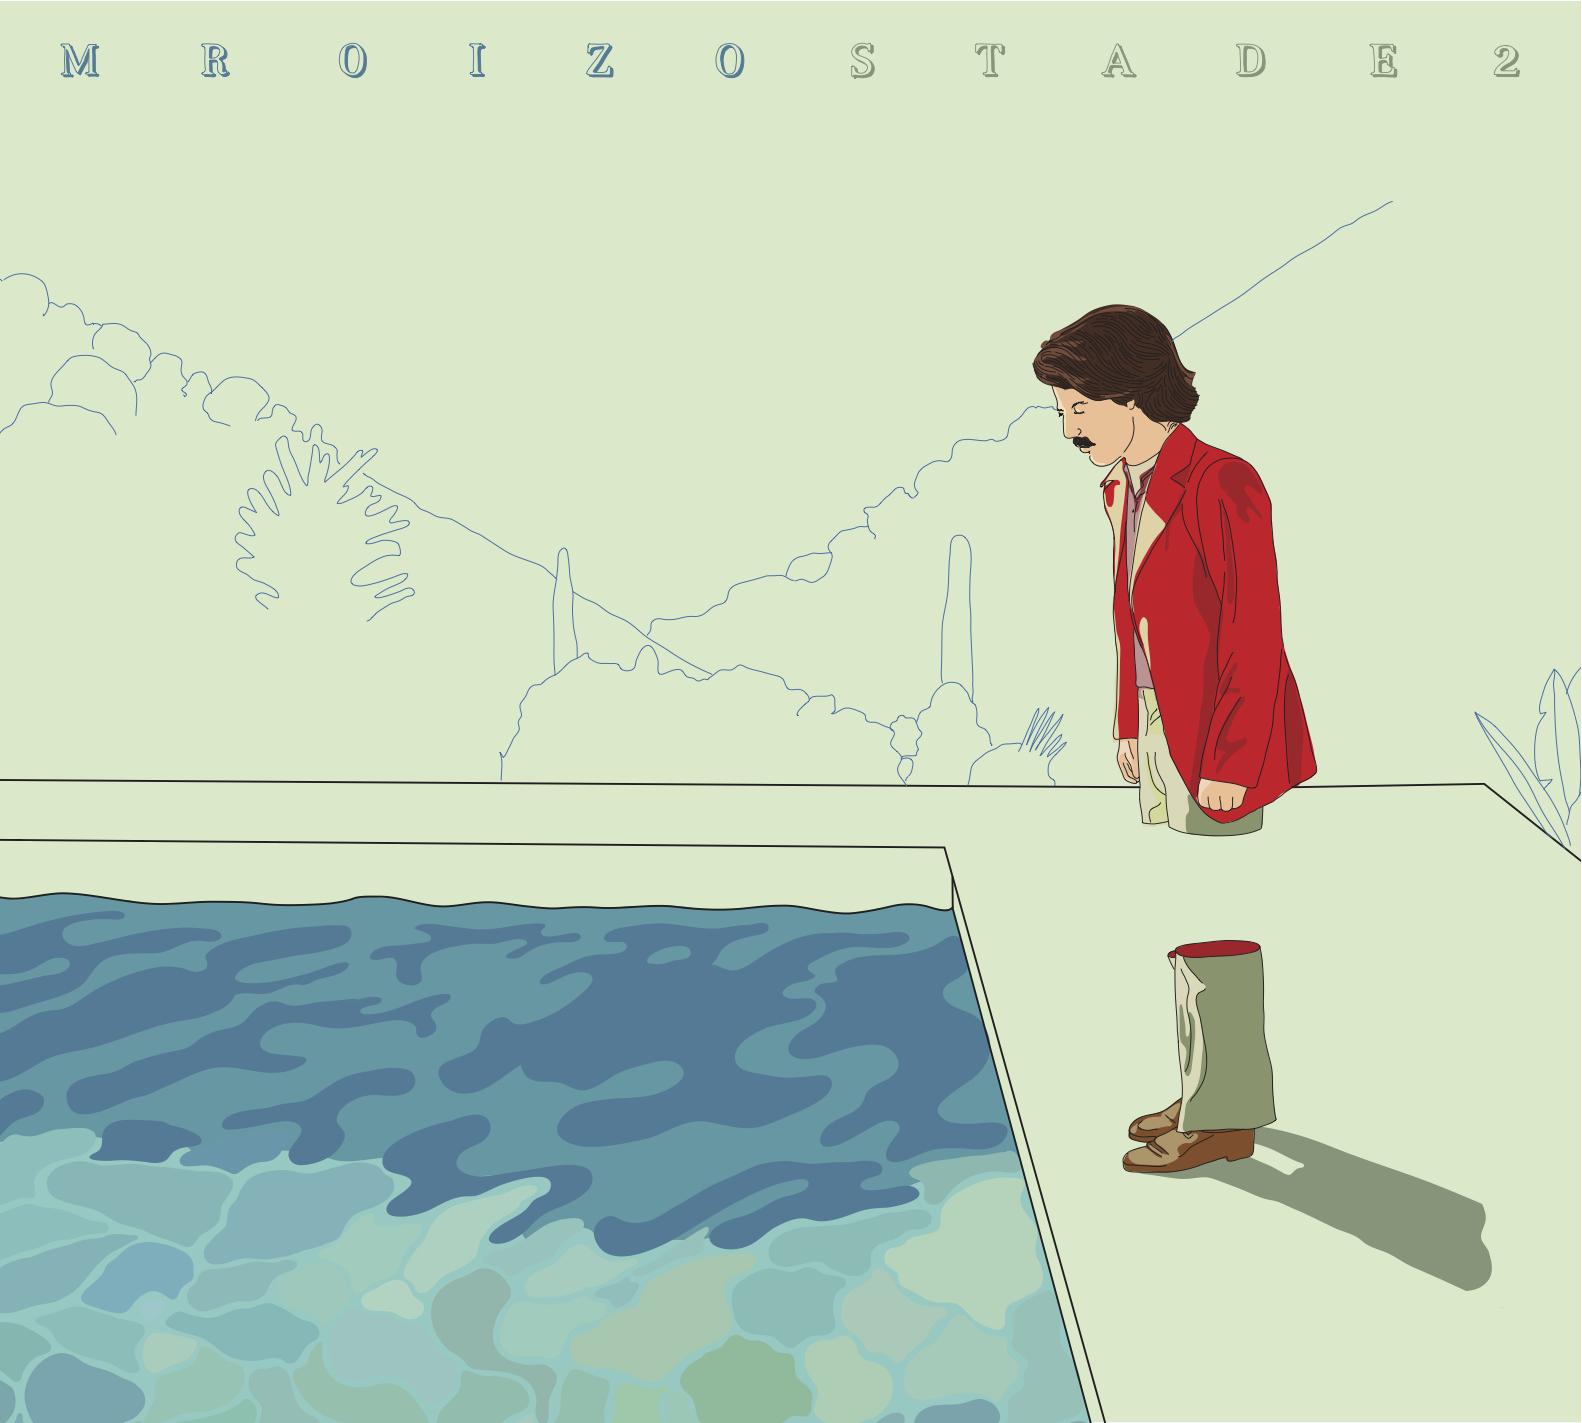 Mr. Oizo – Stade 2 (Ed Banger/Alive)